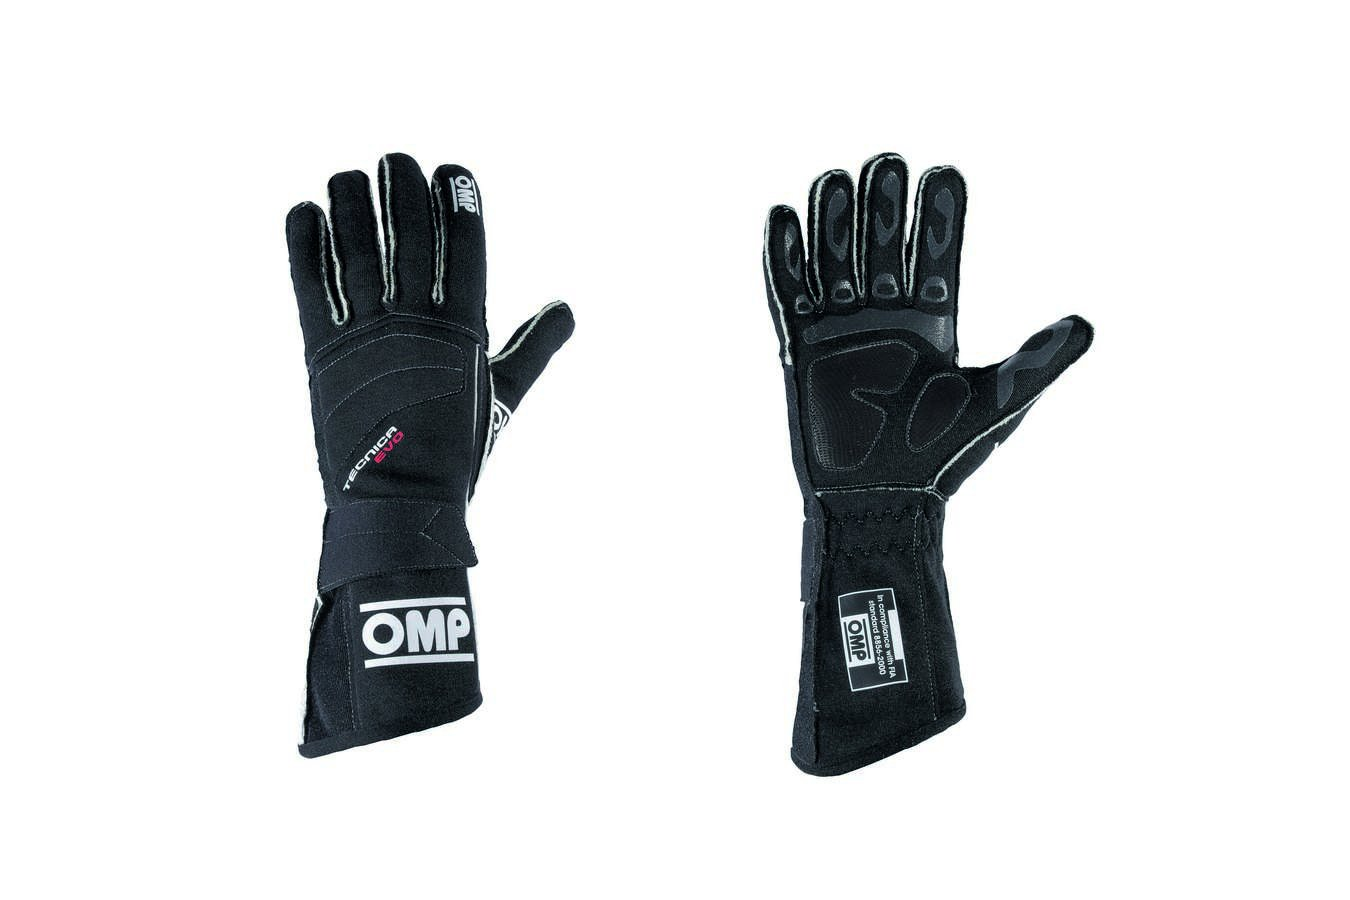 OMP (IB/756/N/XL) Tecnica Evo Gloves, Black, X-Large